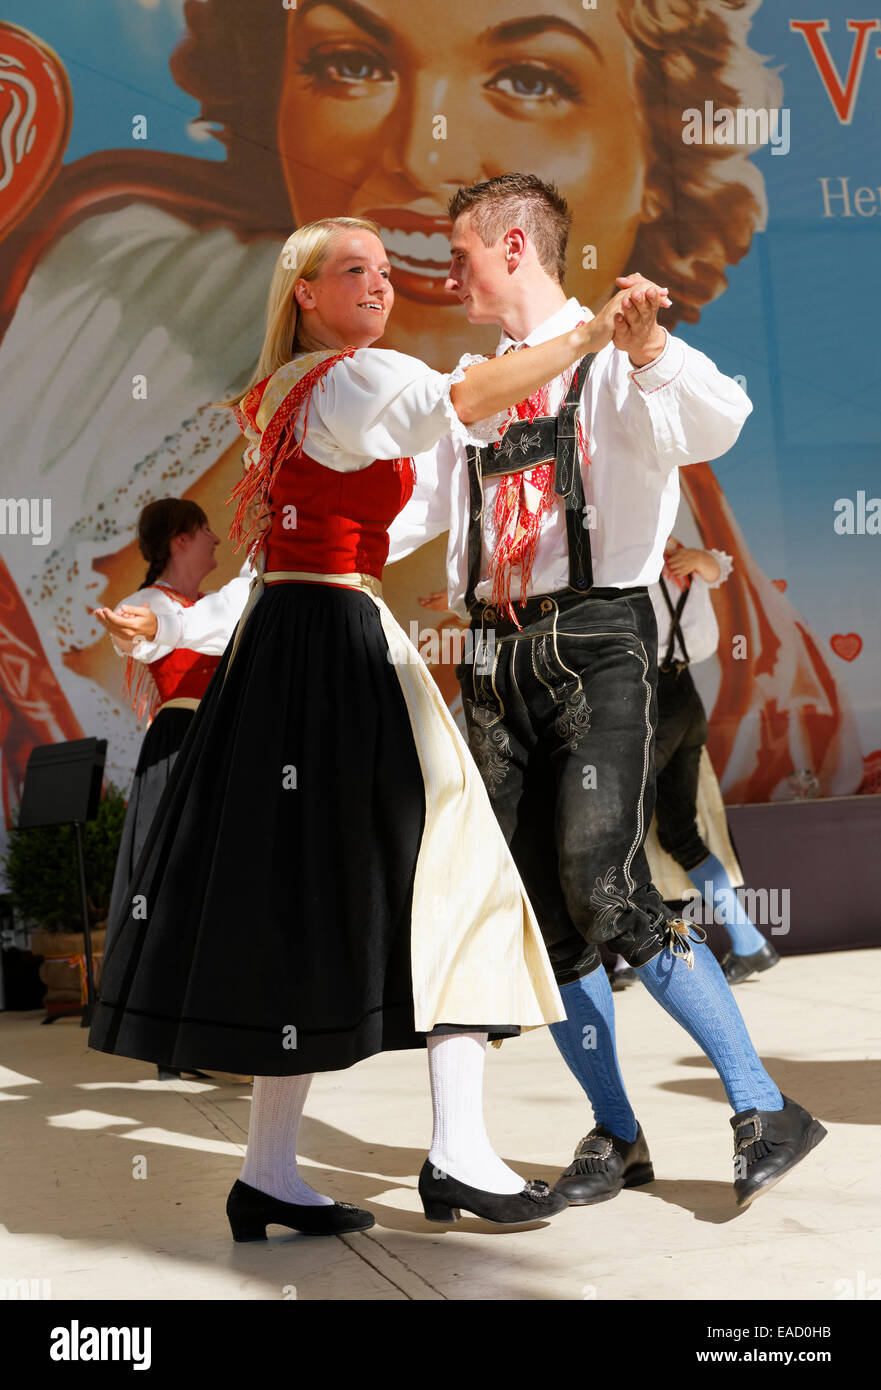 Fuernitz Faaker See folk dance group, Villacher Kirchtag traditional folk festival, Villach, Carinthia, Austria - Stock Image